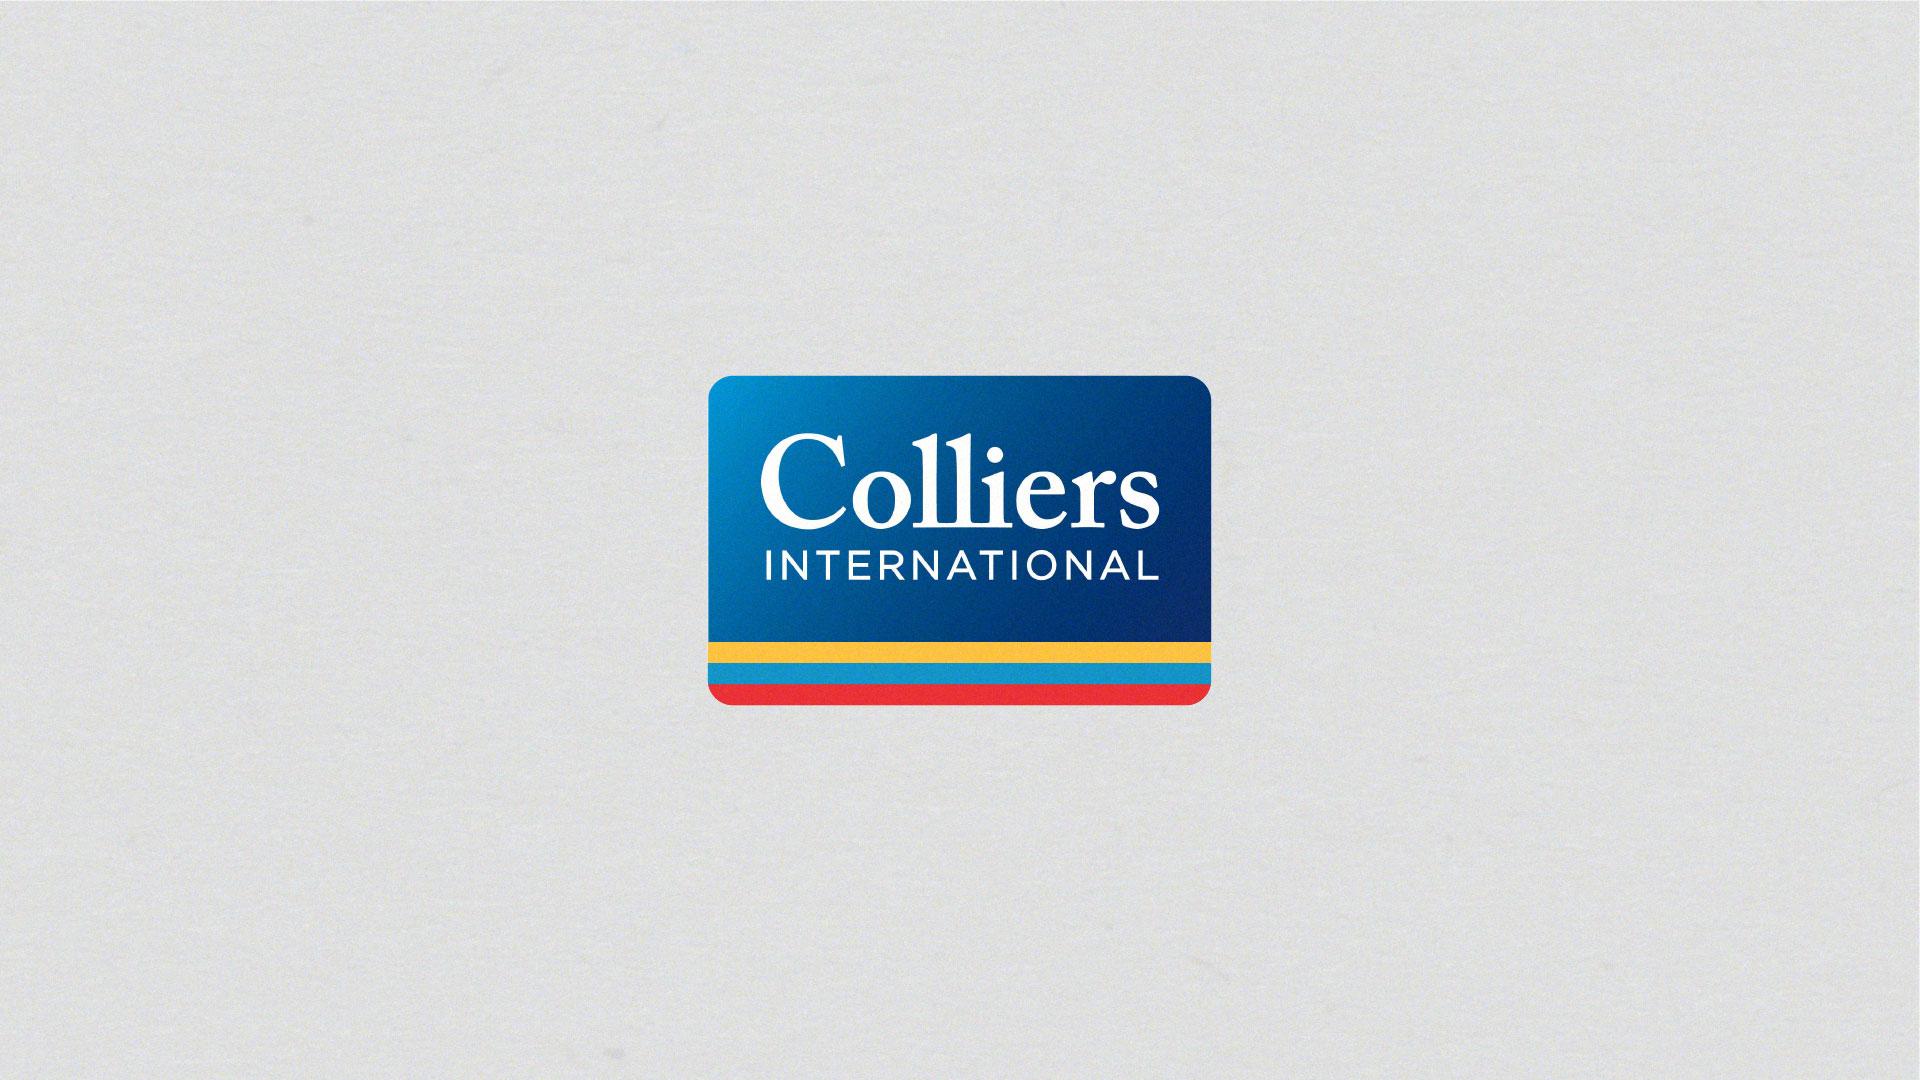 Phanta_Colliers_Styleframes_0525_00035.jpg